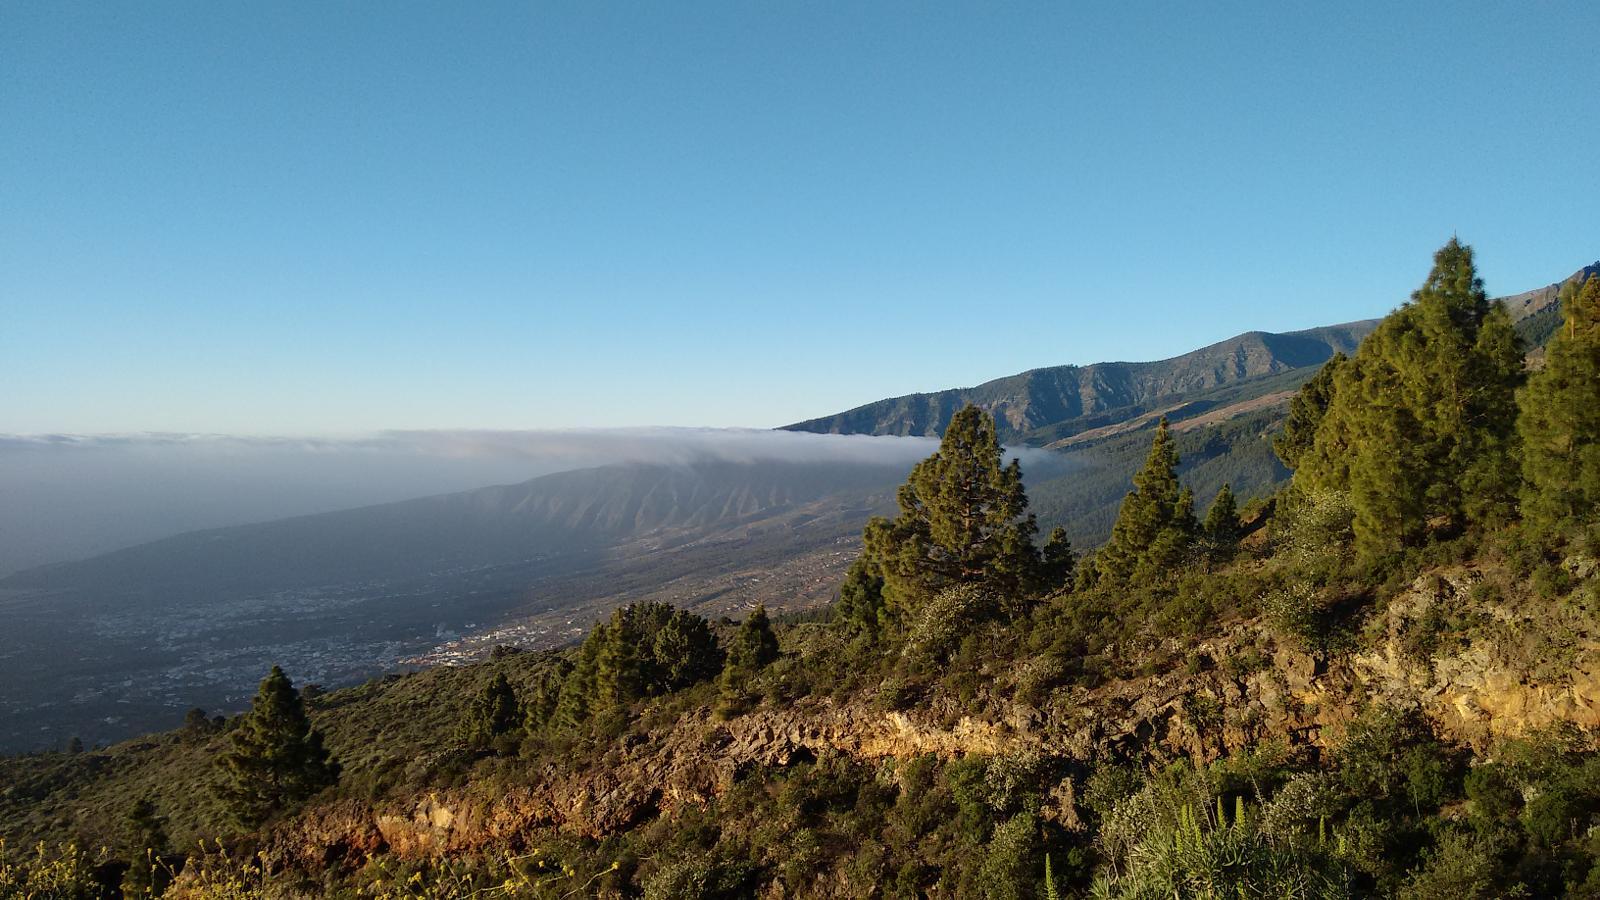 Mirador de Chivisaya